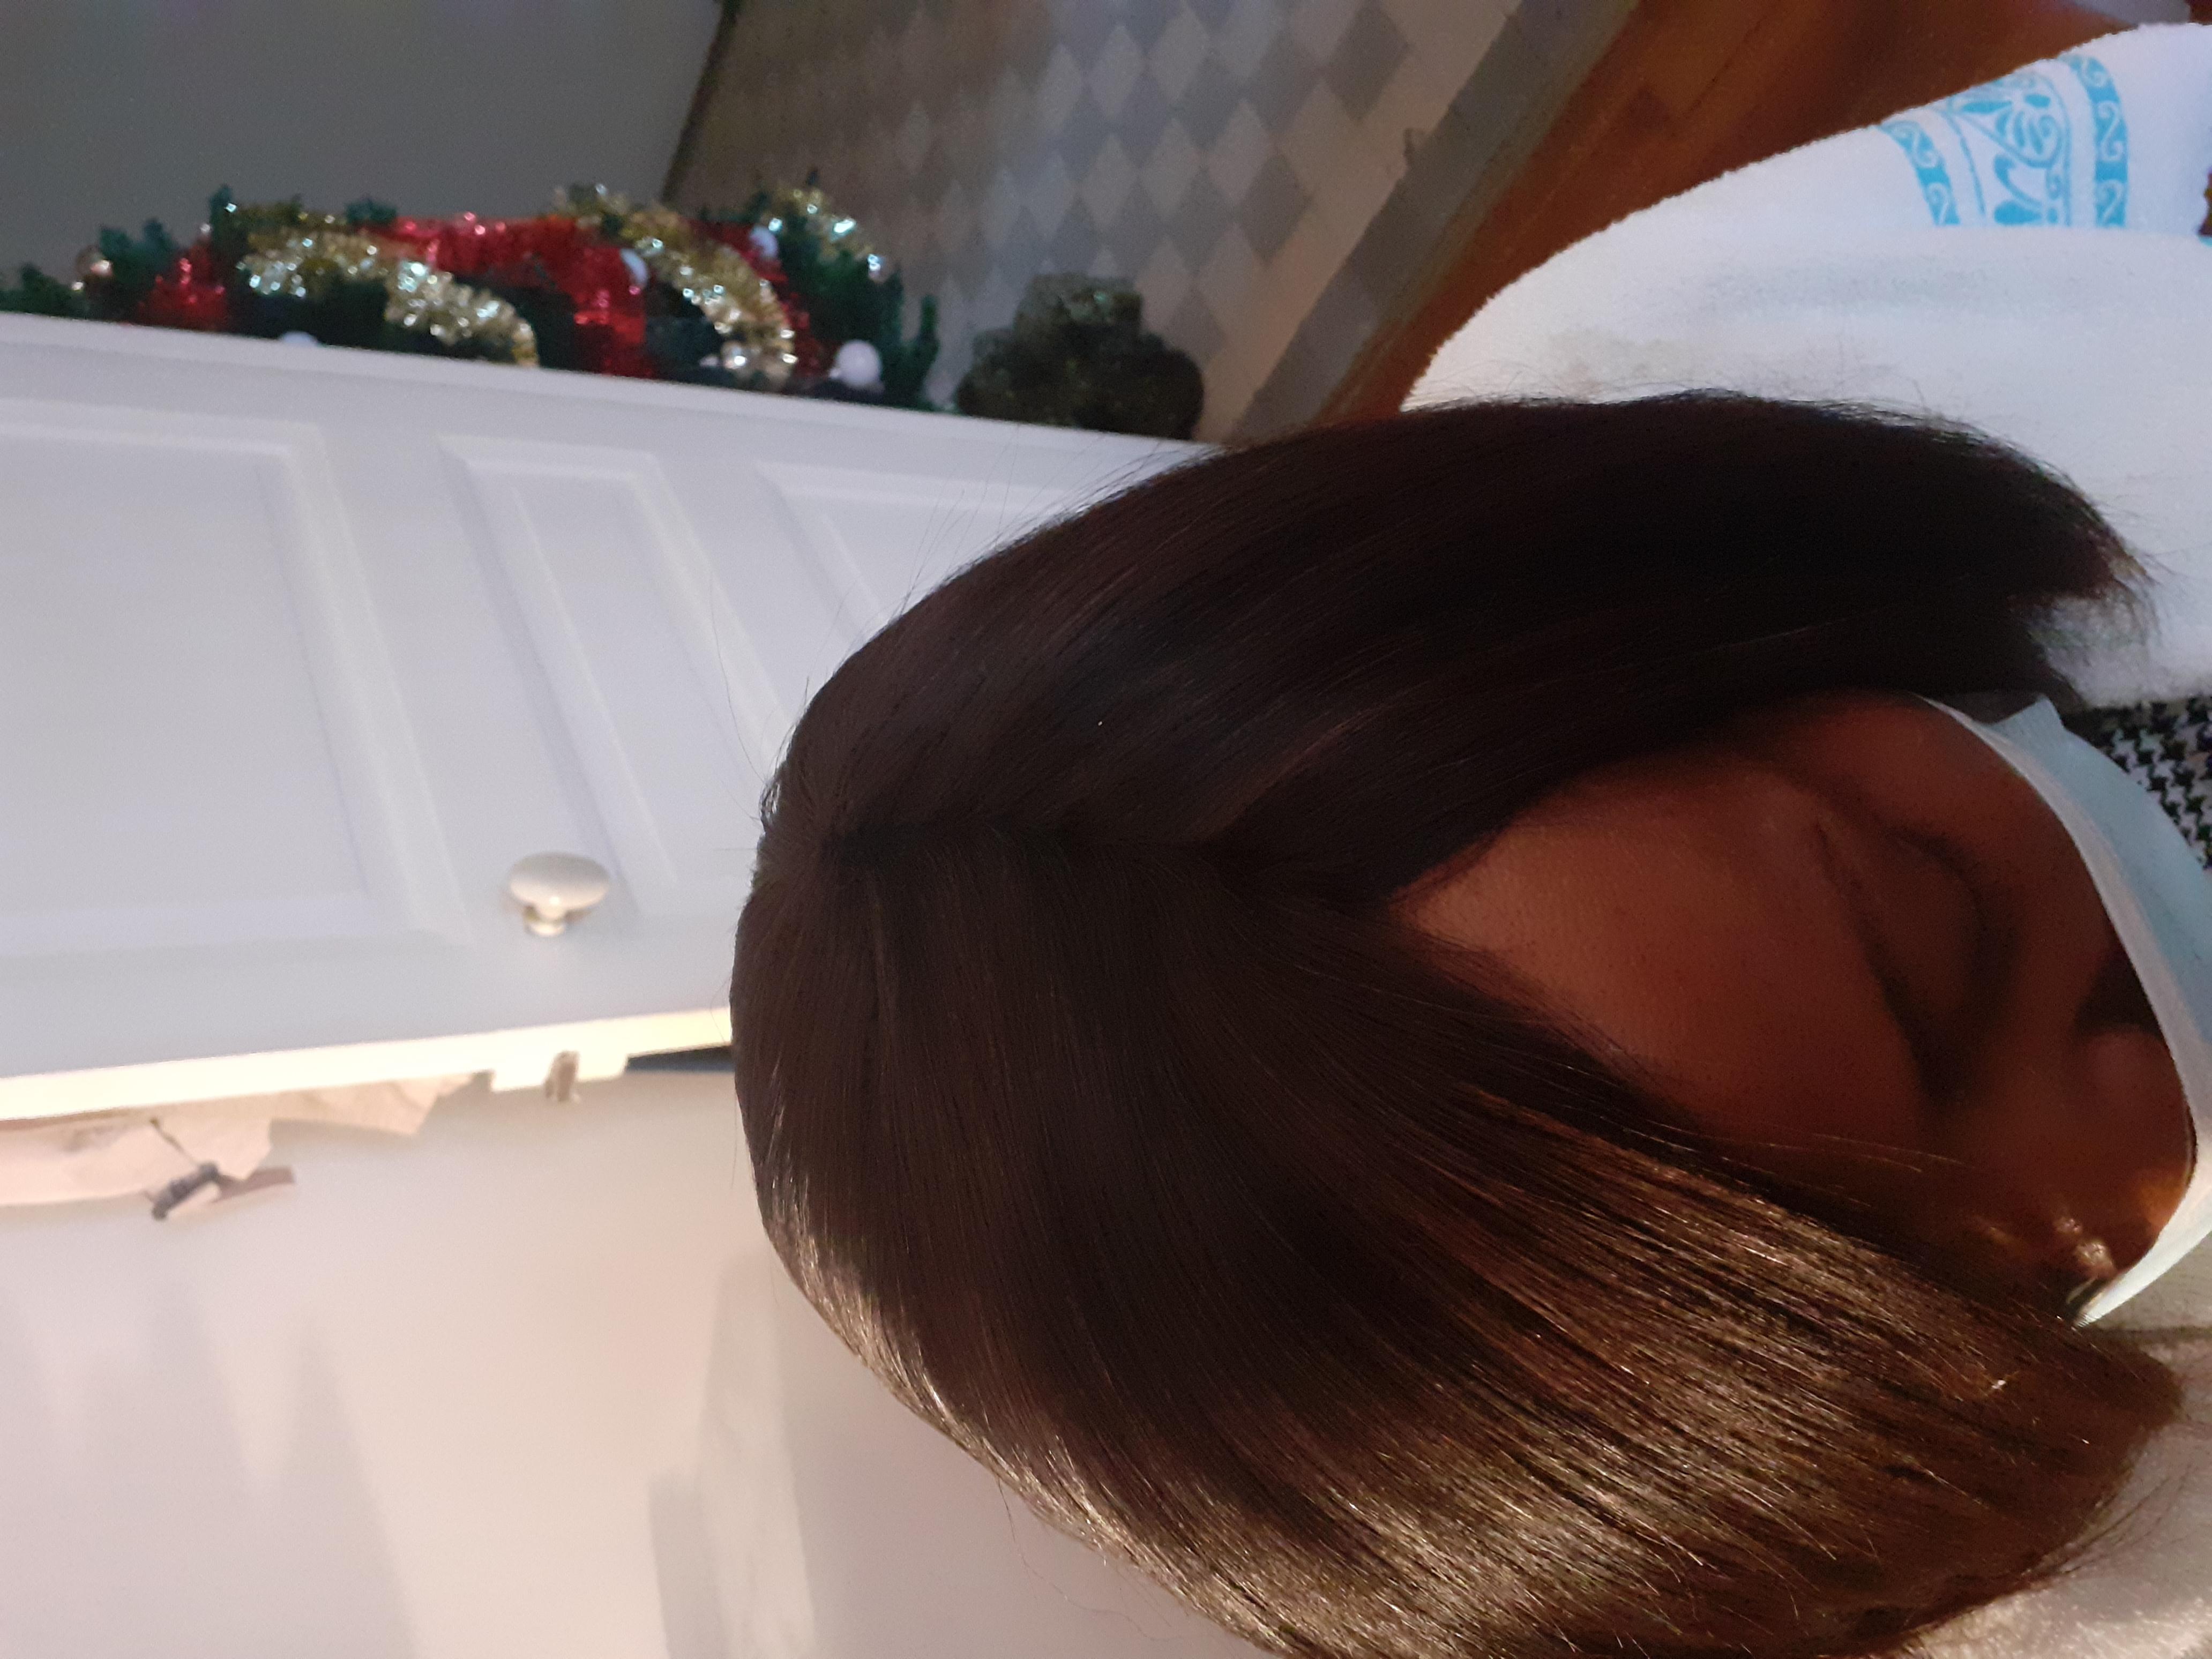 salon de coiffure afro tresse tresses box braids crochet braids vanilles tissages paris 75 77 78 91 92 93 94 95 IHQDQQEX